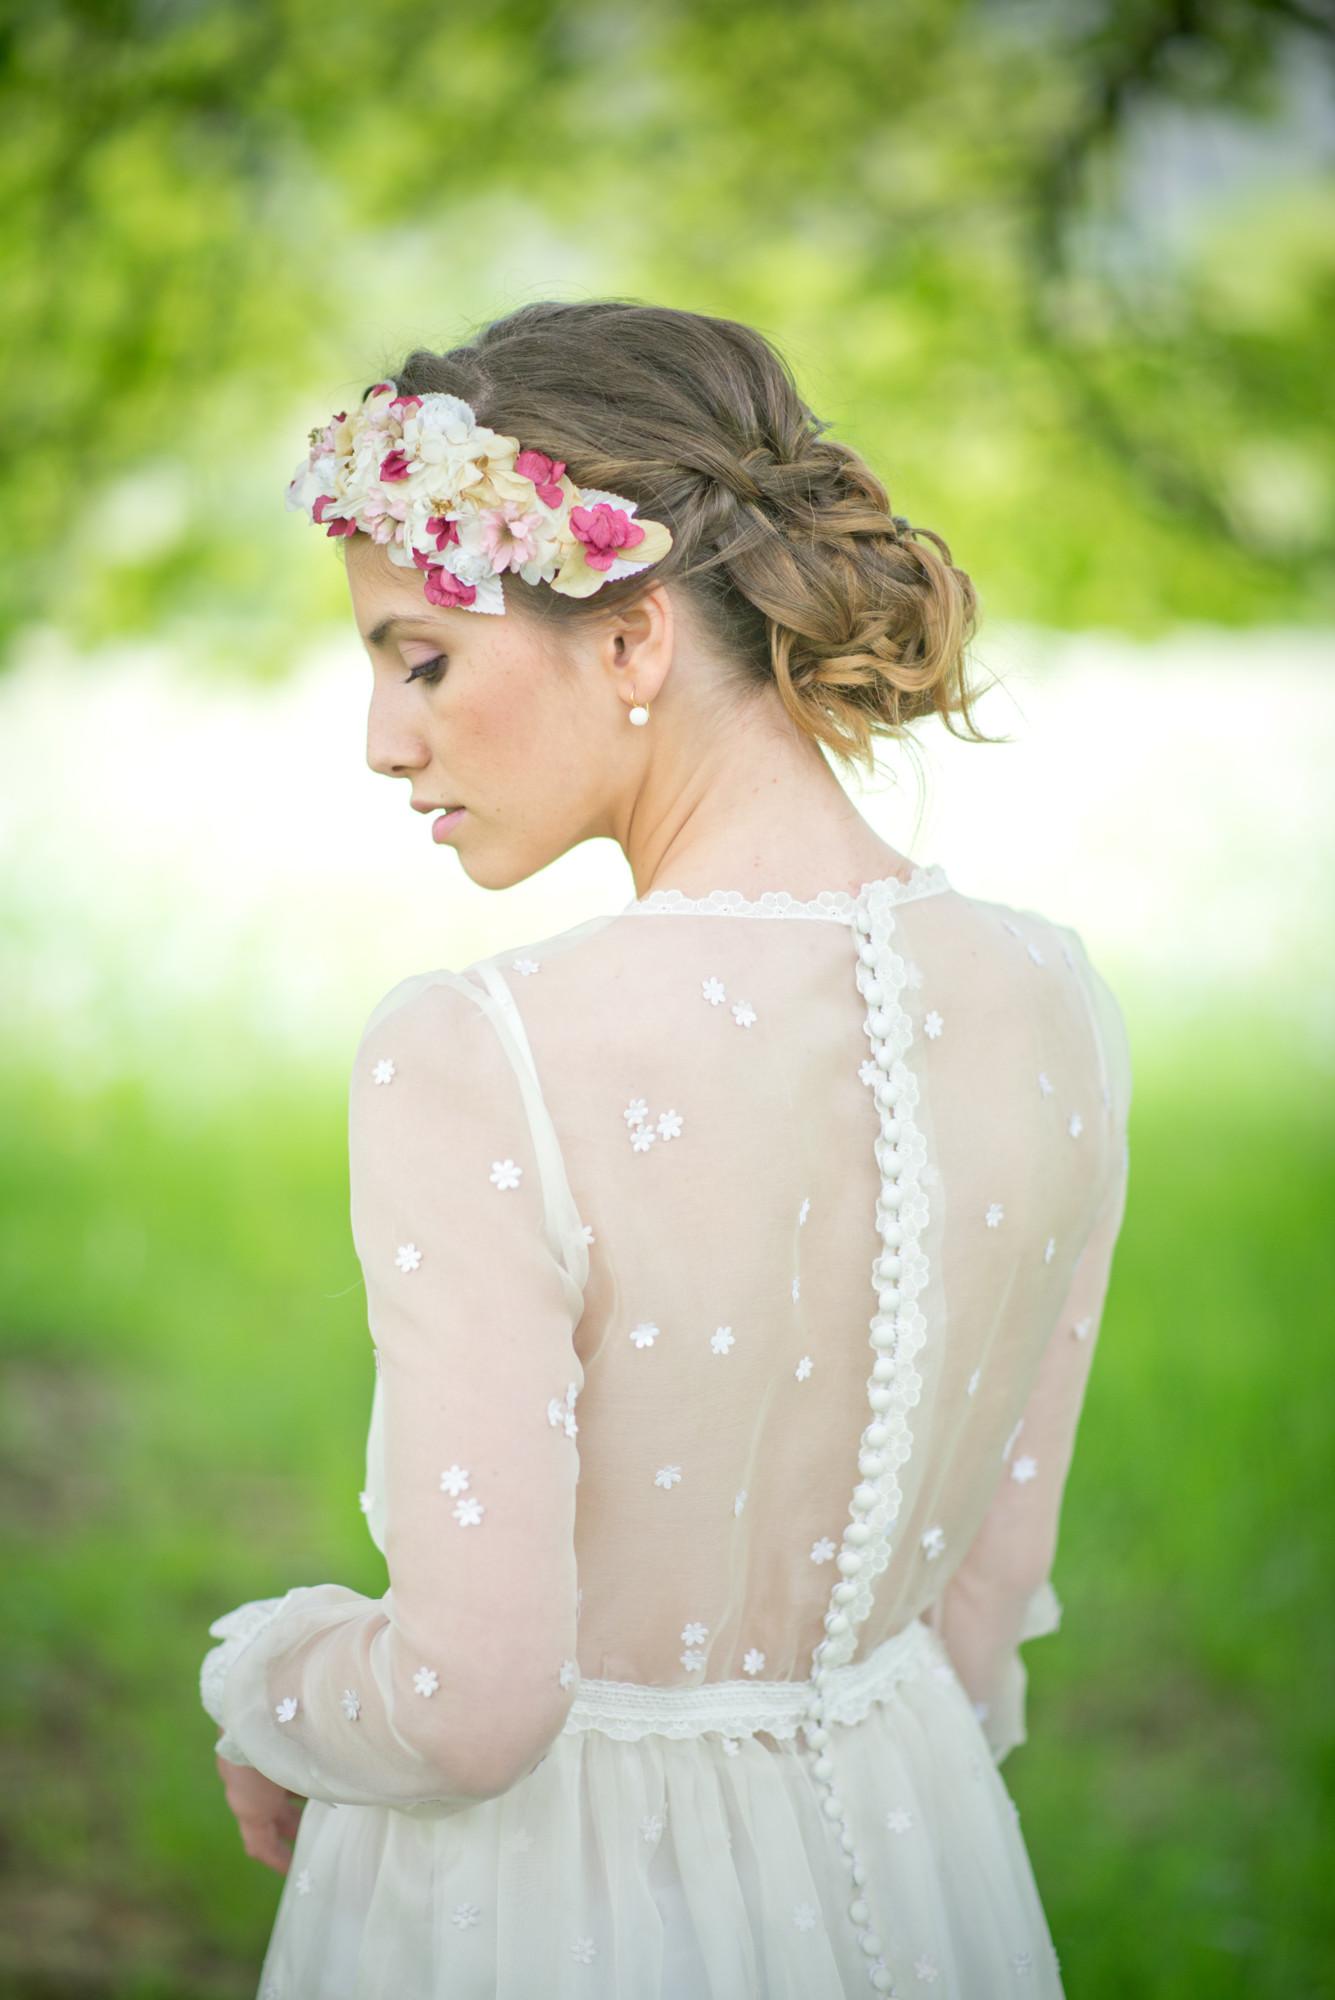 Las 11 tendencias que debes seguir si te vistes de novia este 2016 b21a86718dbd